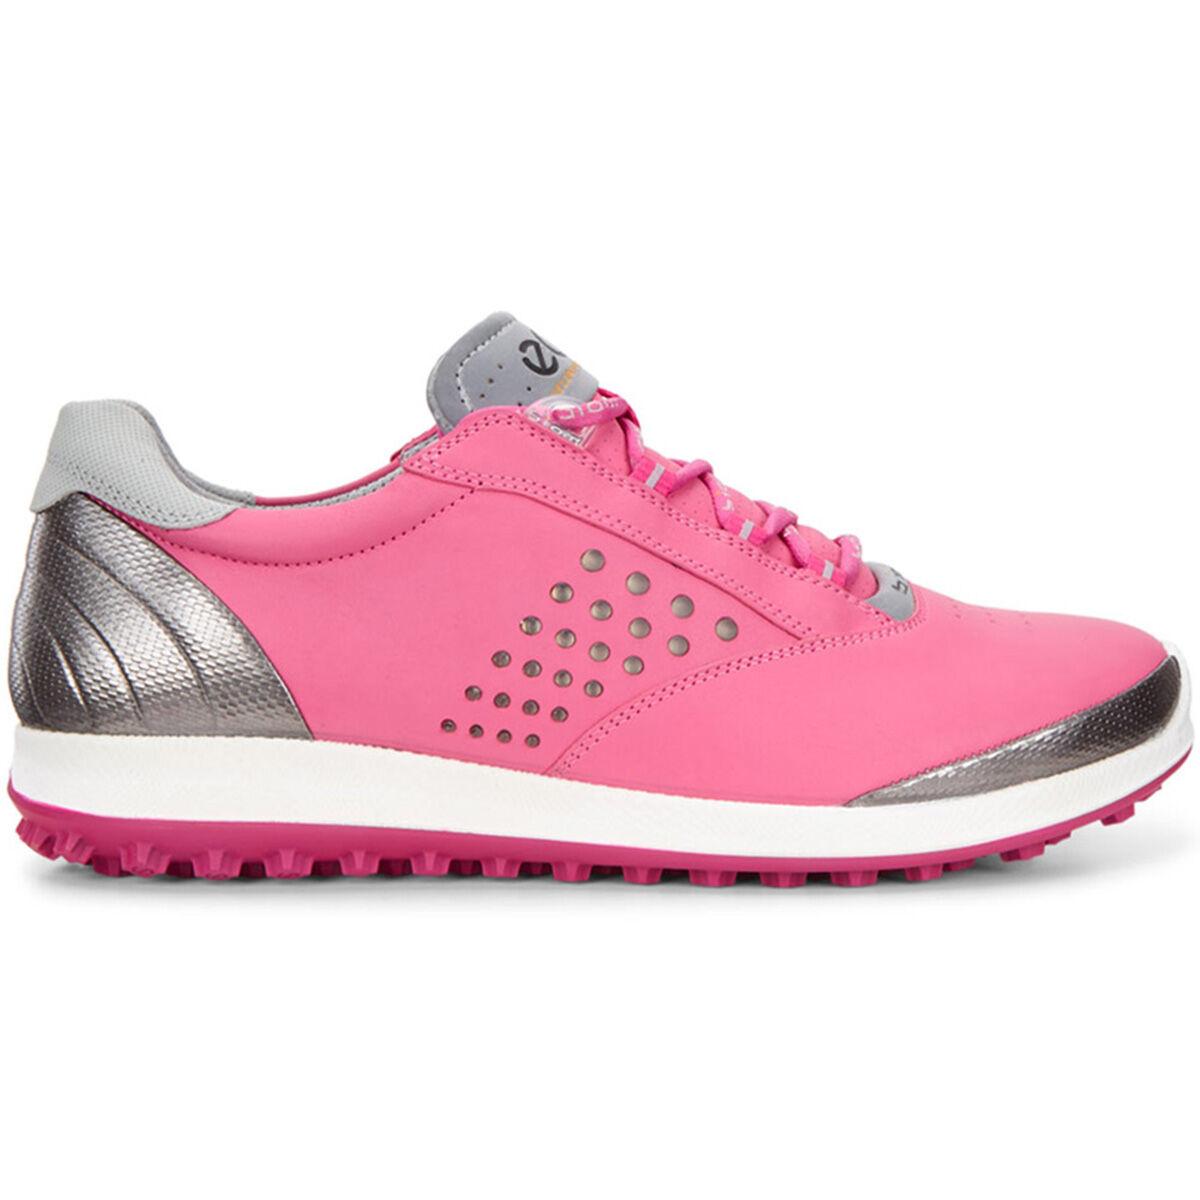 Crampons Ecco Femmes Biom Chaussures 2 Pour 2016 Hybrid Sans EHYeDW29I